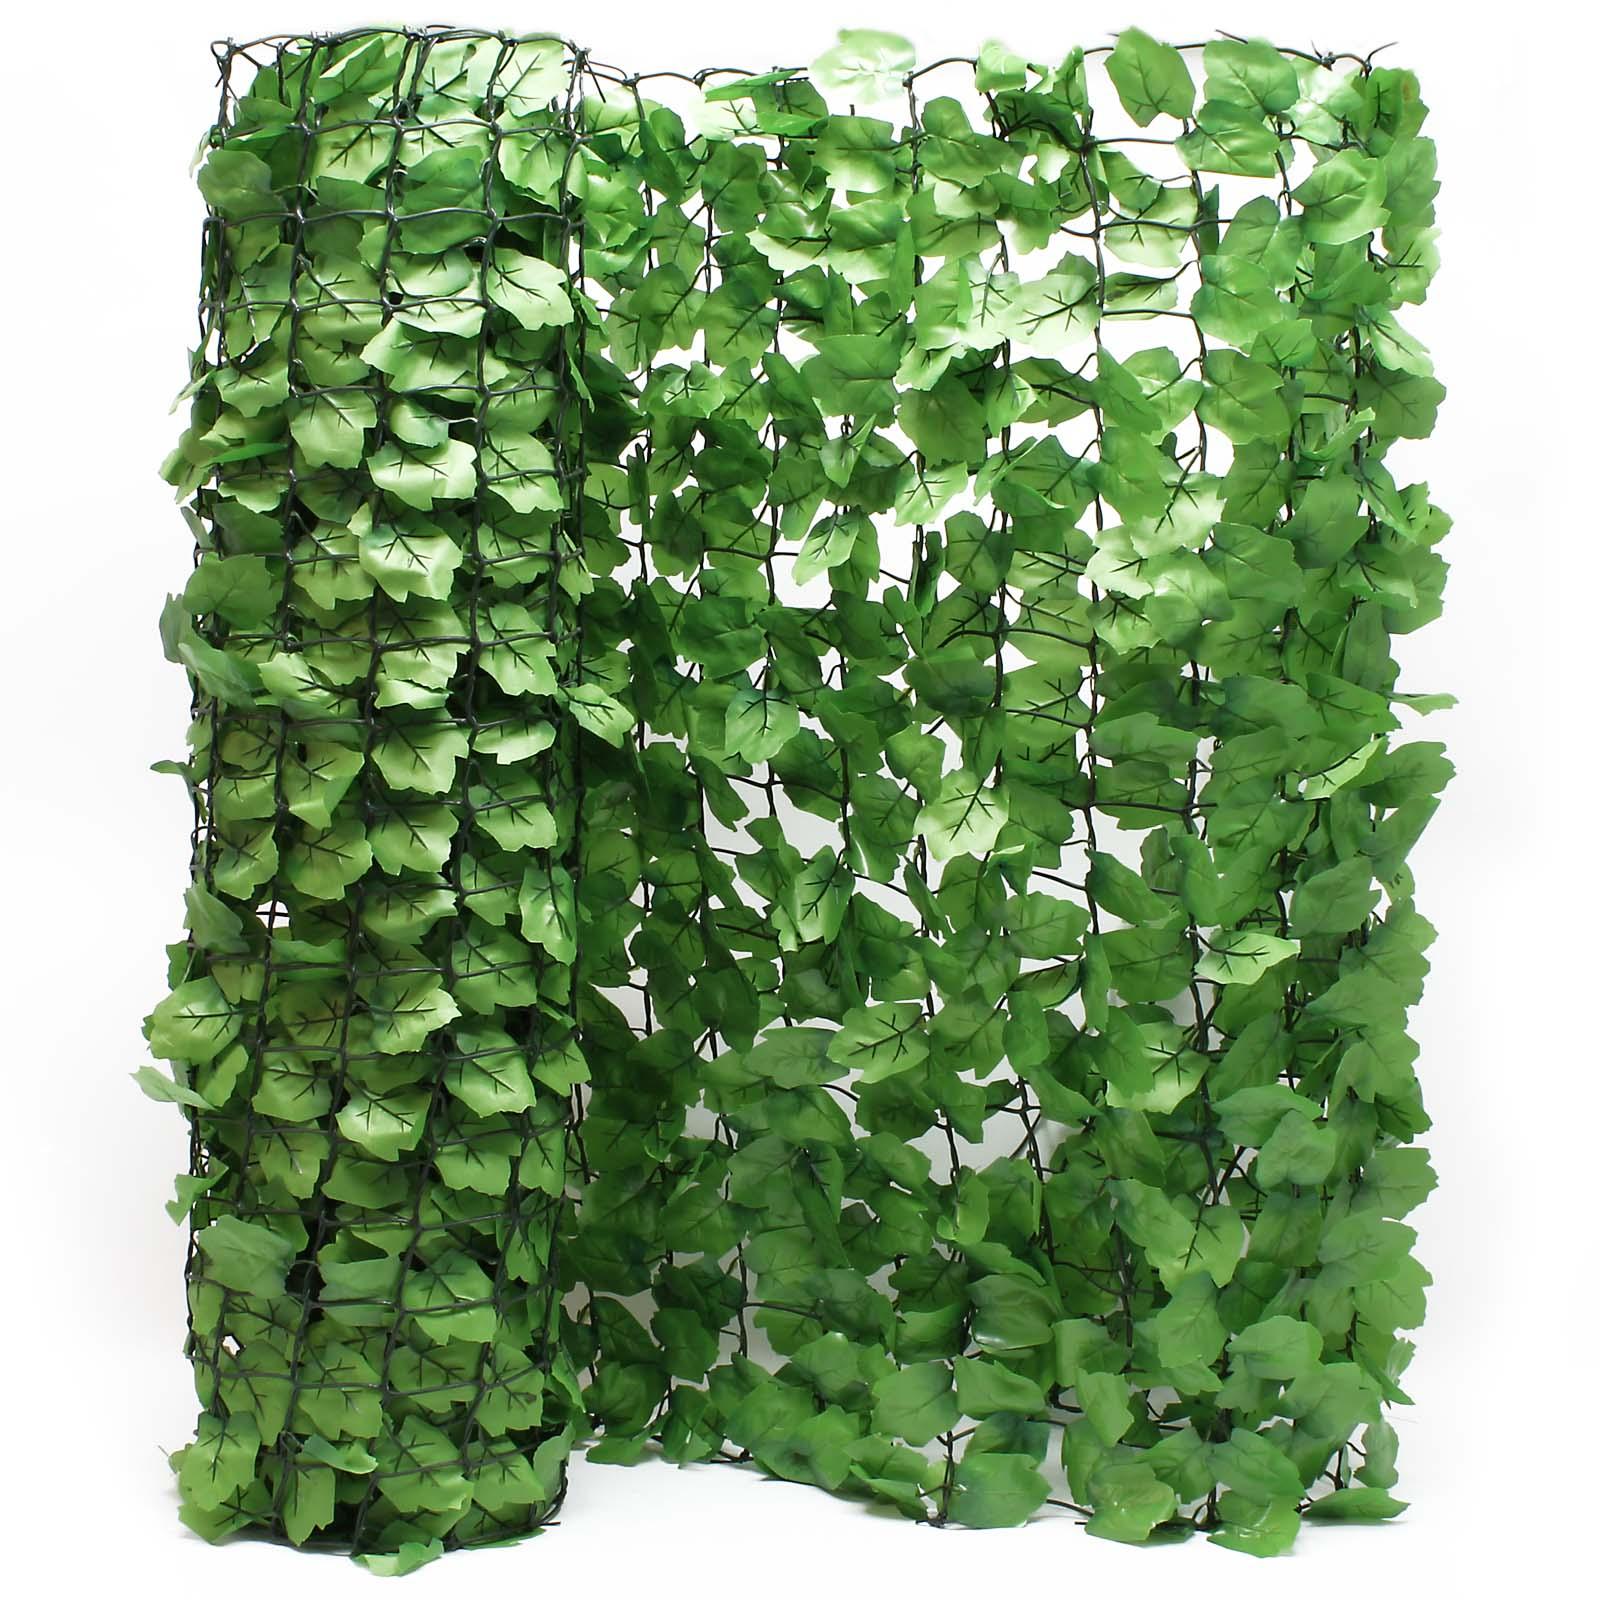 leaf 300x100 cm Windscreen blind patio balcony fence sight protection